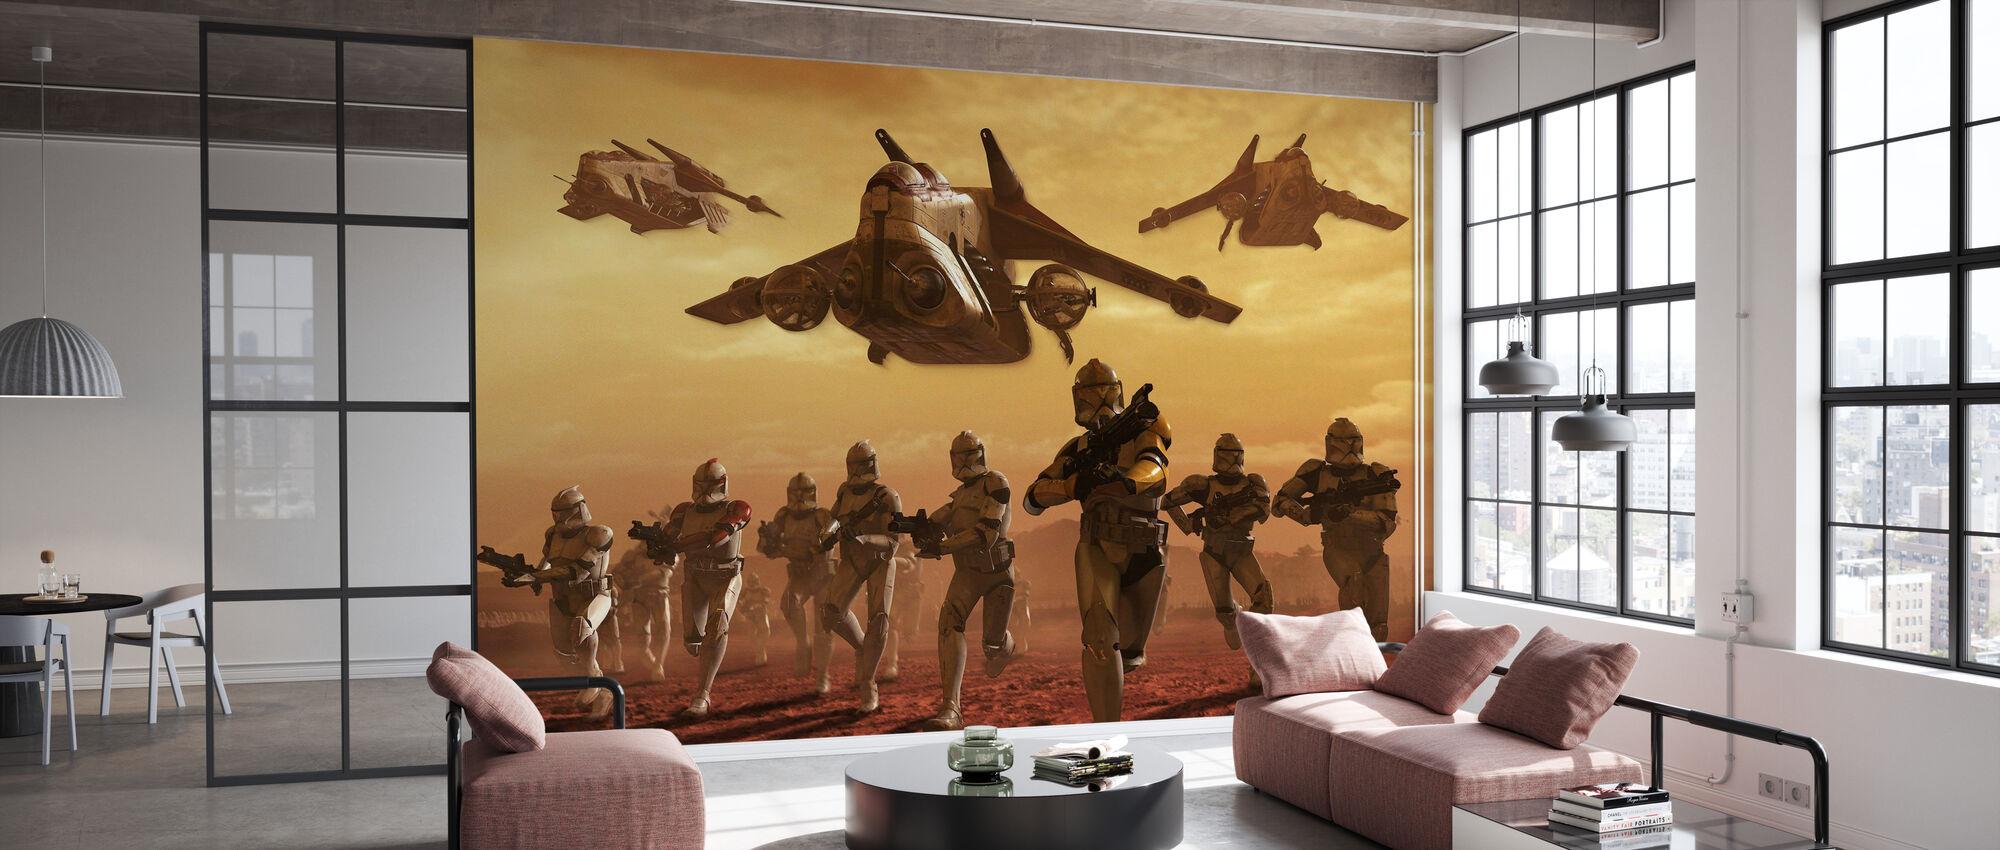 Star Wars - Klon Troopers på Geonosis - Tapet - Kontor